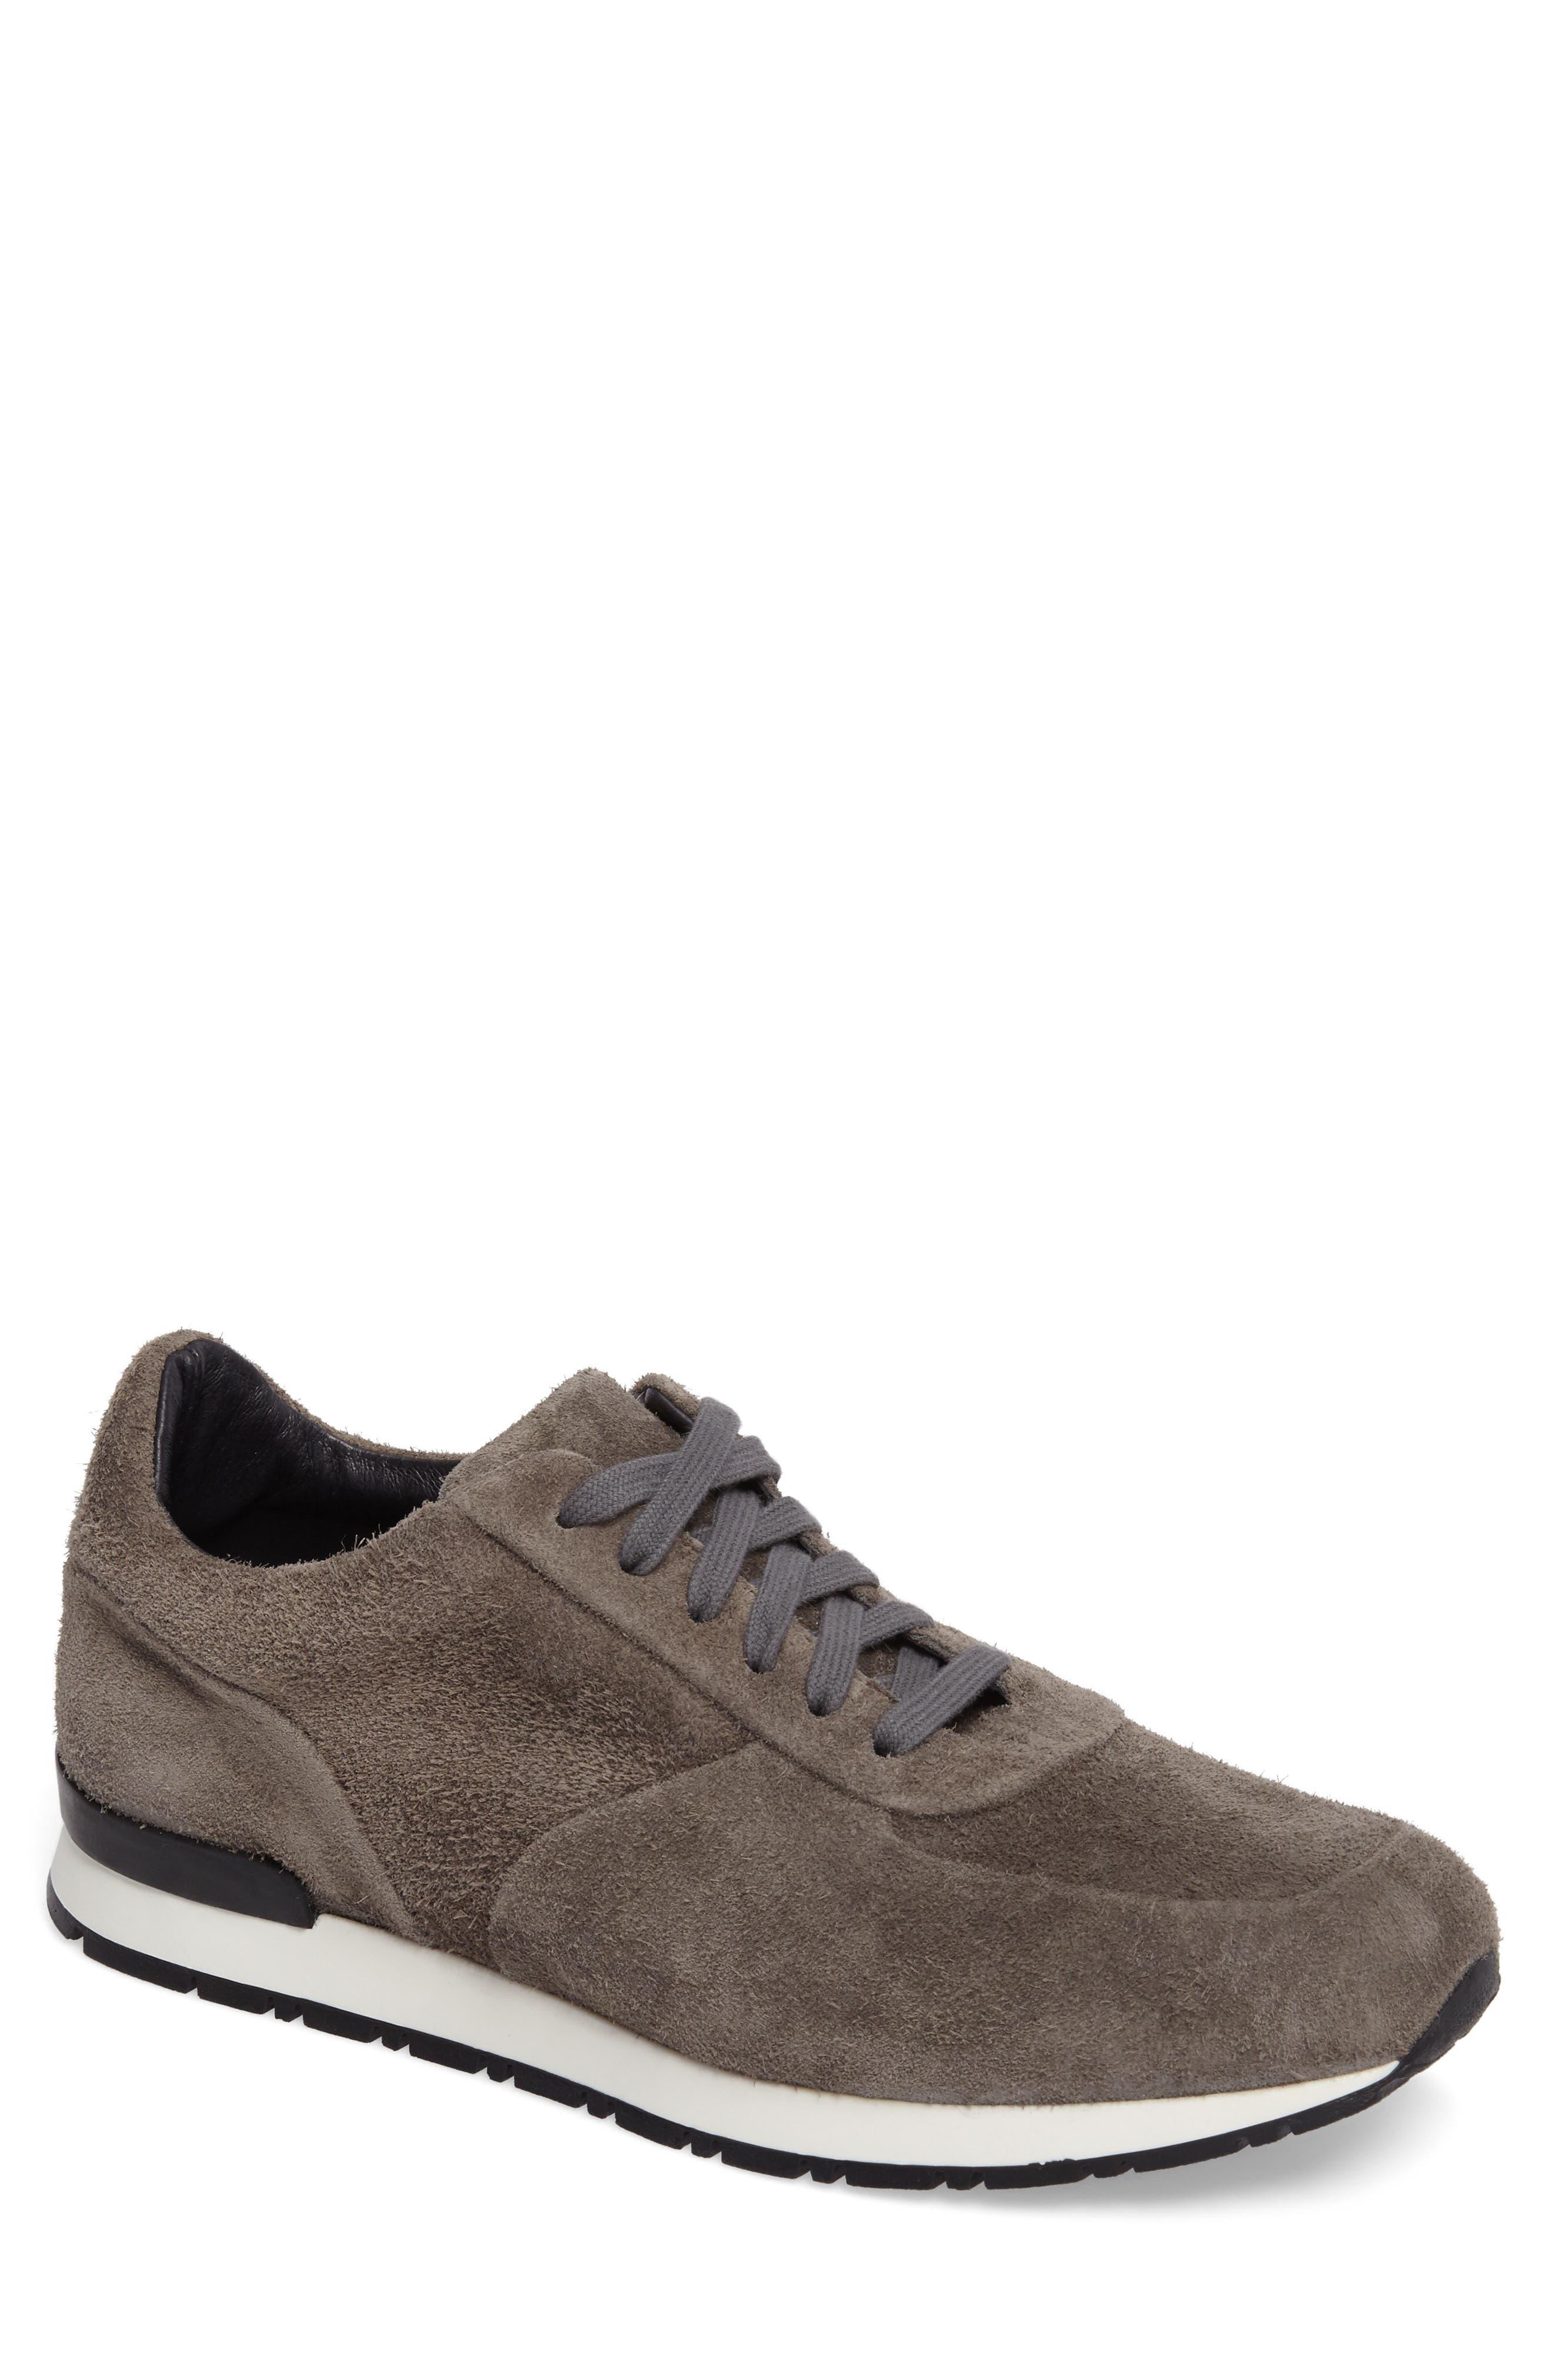 Hairy Sneaker,                         Main,                         color, Grey Suede